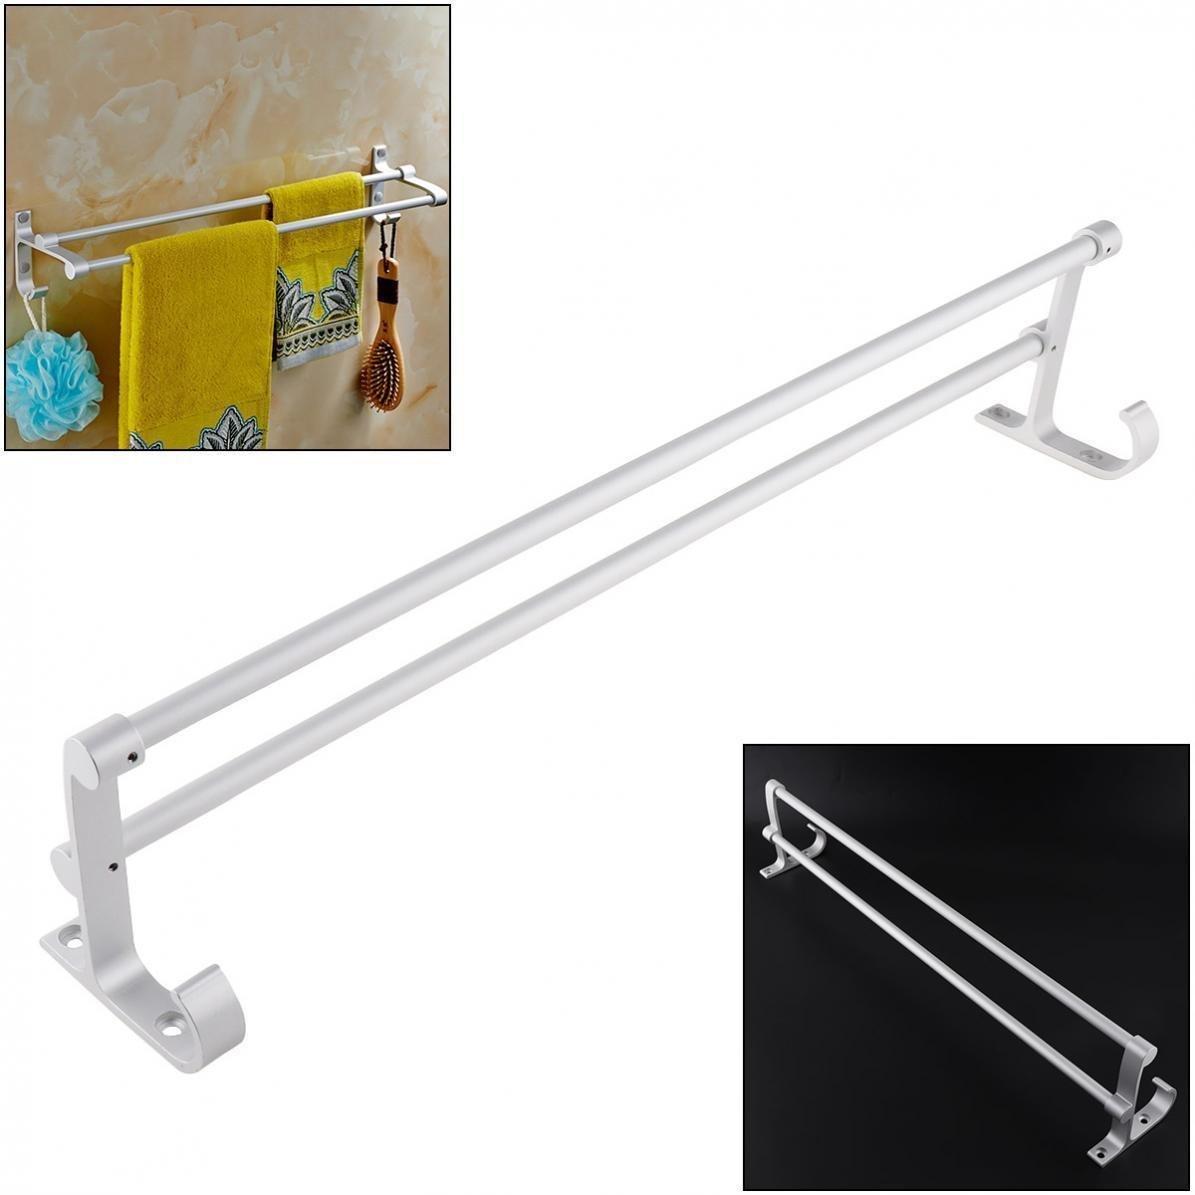 Agordo Aluminum Double Bar Home Towel Rail Rack Wall Mounted Holder Hanger for Bathroom